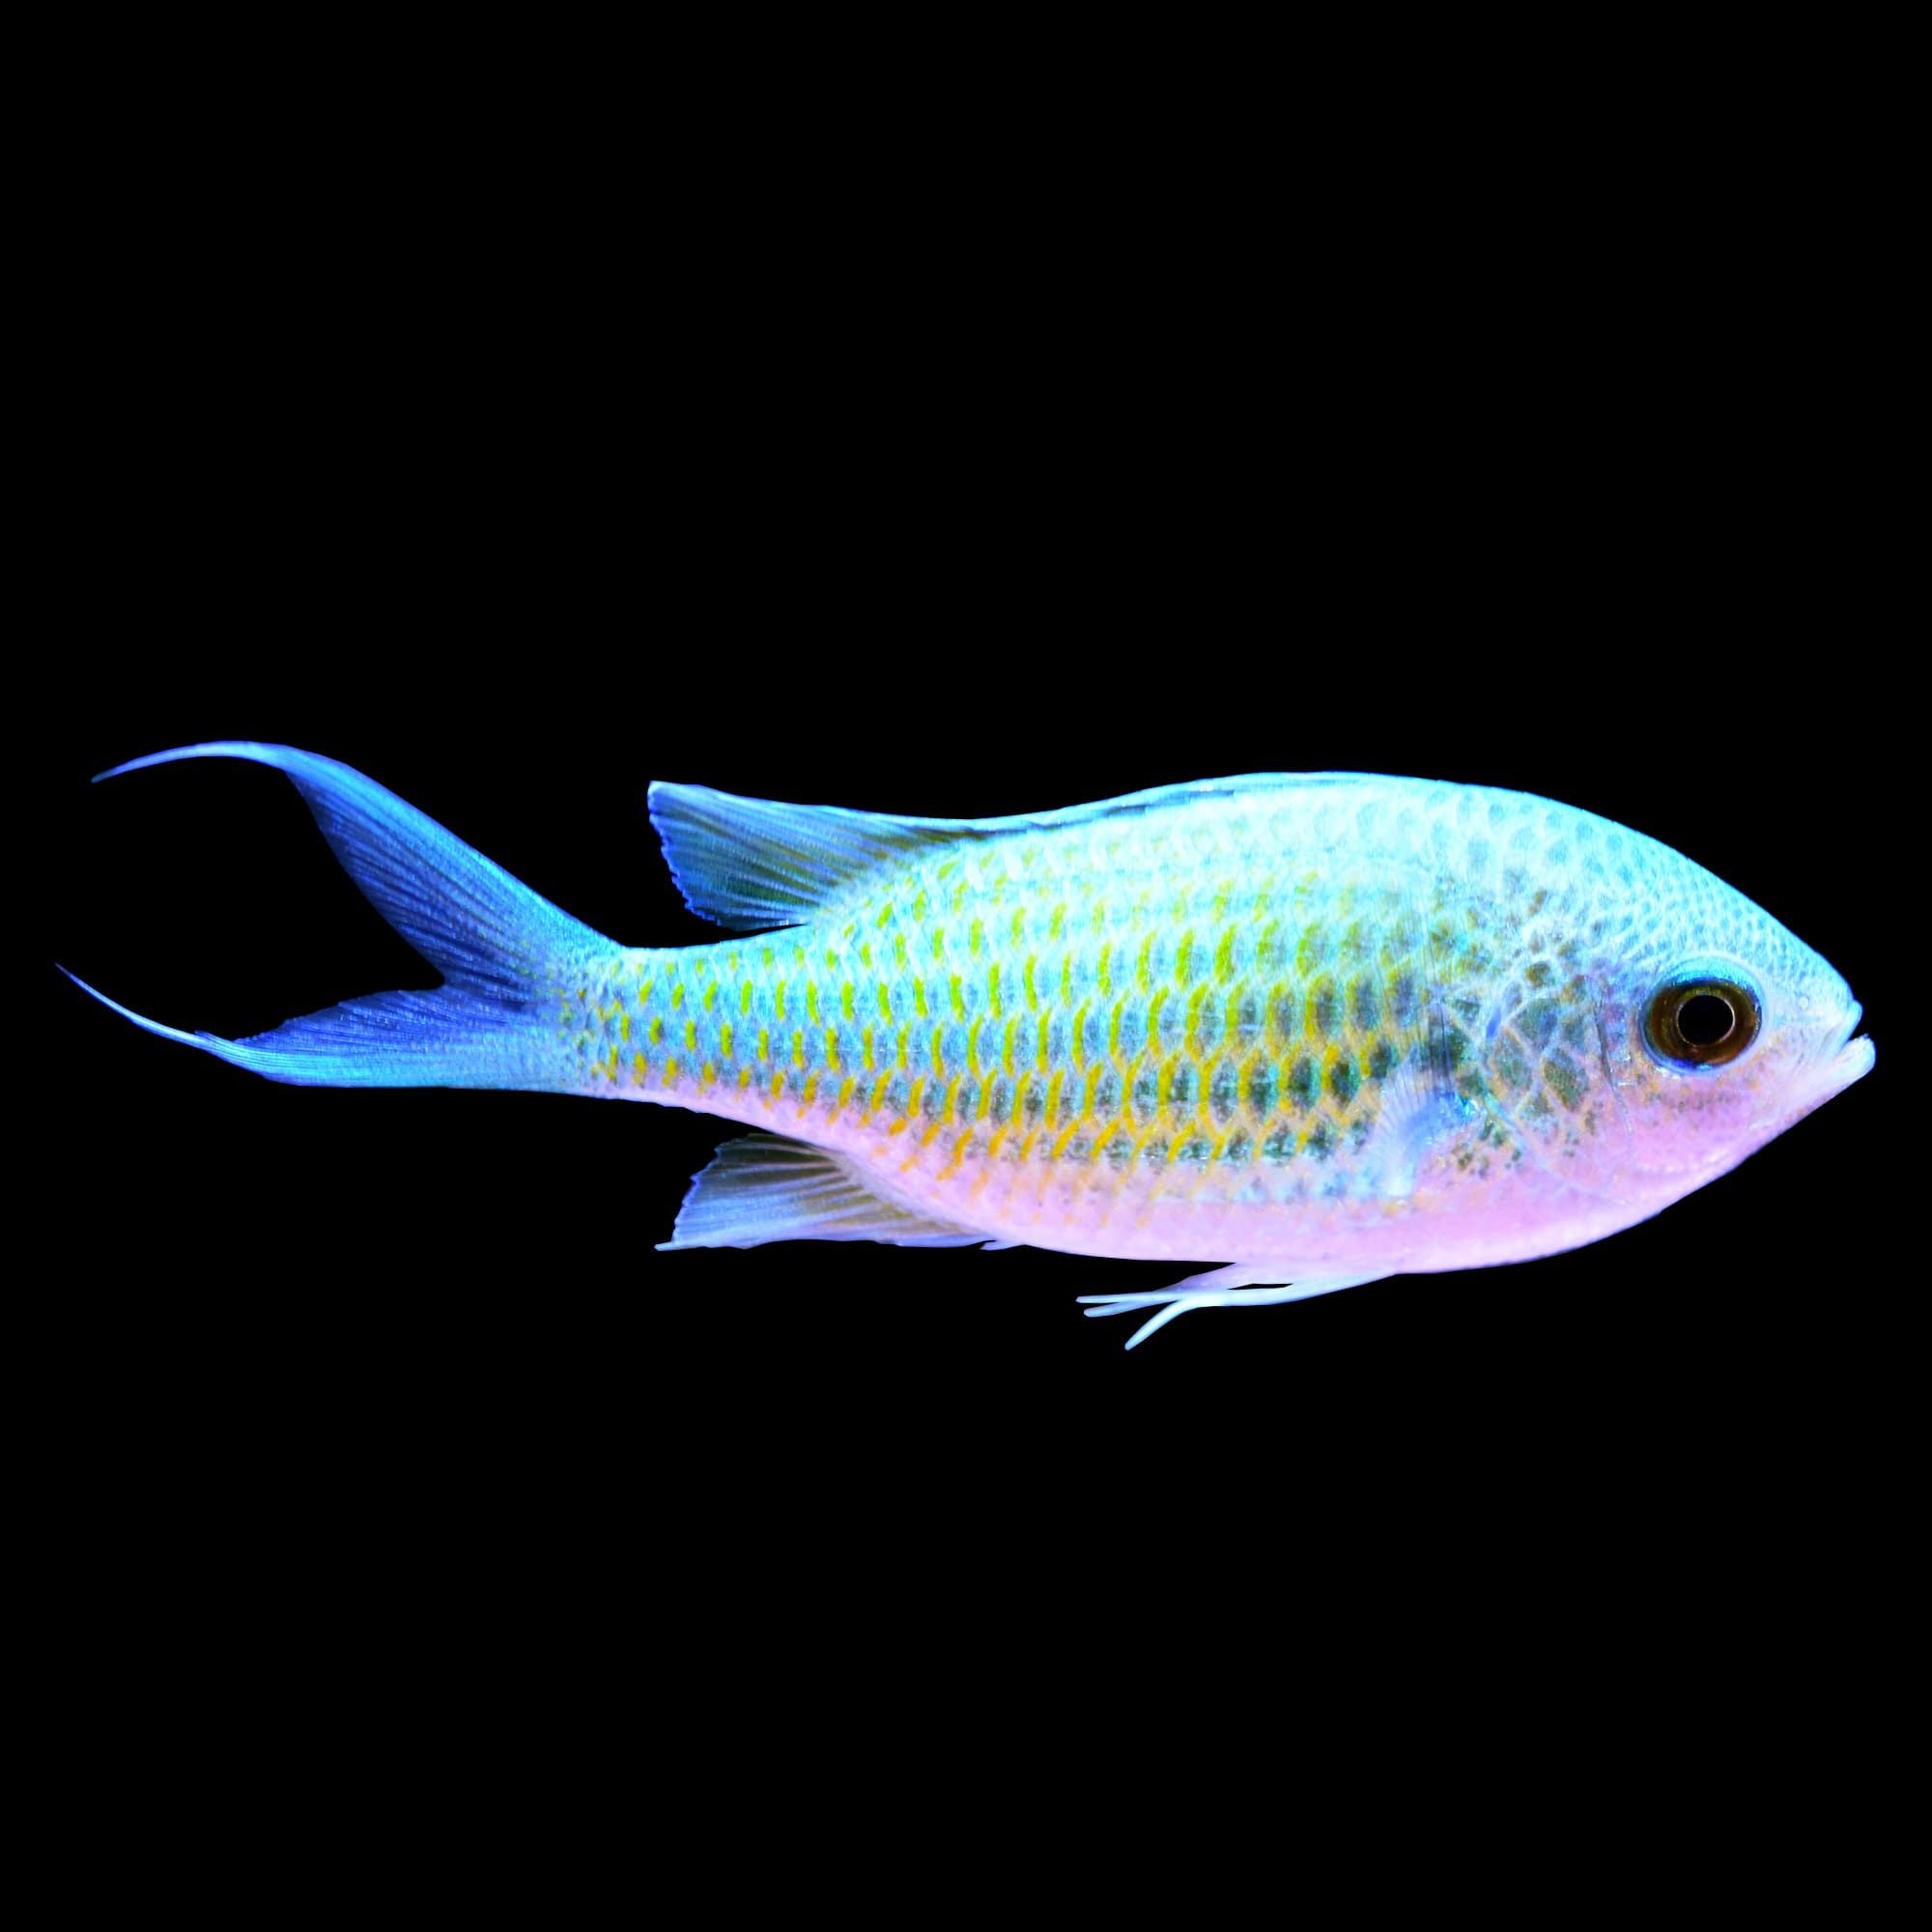 Green Chromis Fish For Sale Order Online Petco In 2020 Small Fish Tanks Saltwater Fish Tanks Salt Water Fish